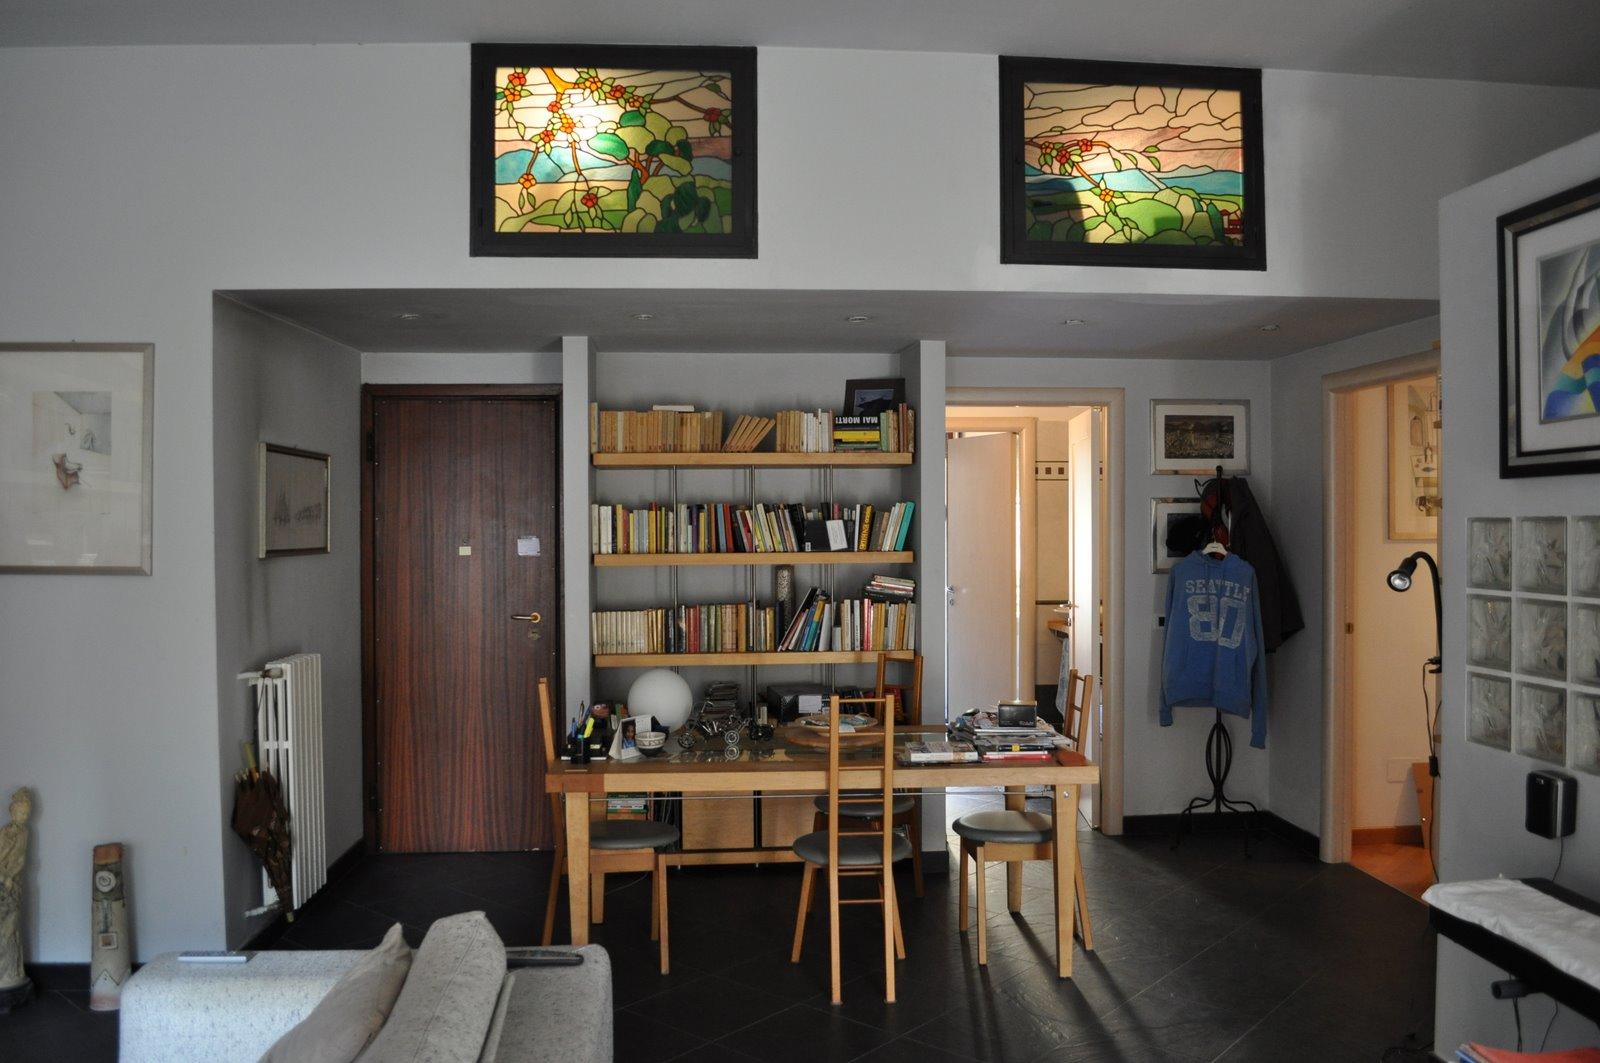 Cucine Open Space Idee Cucine E Living Foto Oltre Le Cucine #956B36 1600 1063 Come Arredare Cucina E Salone Insieme